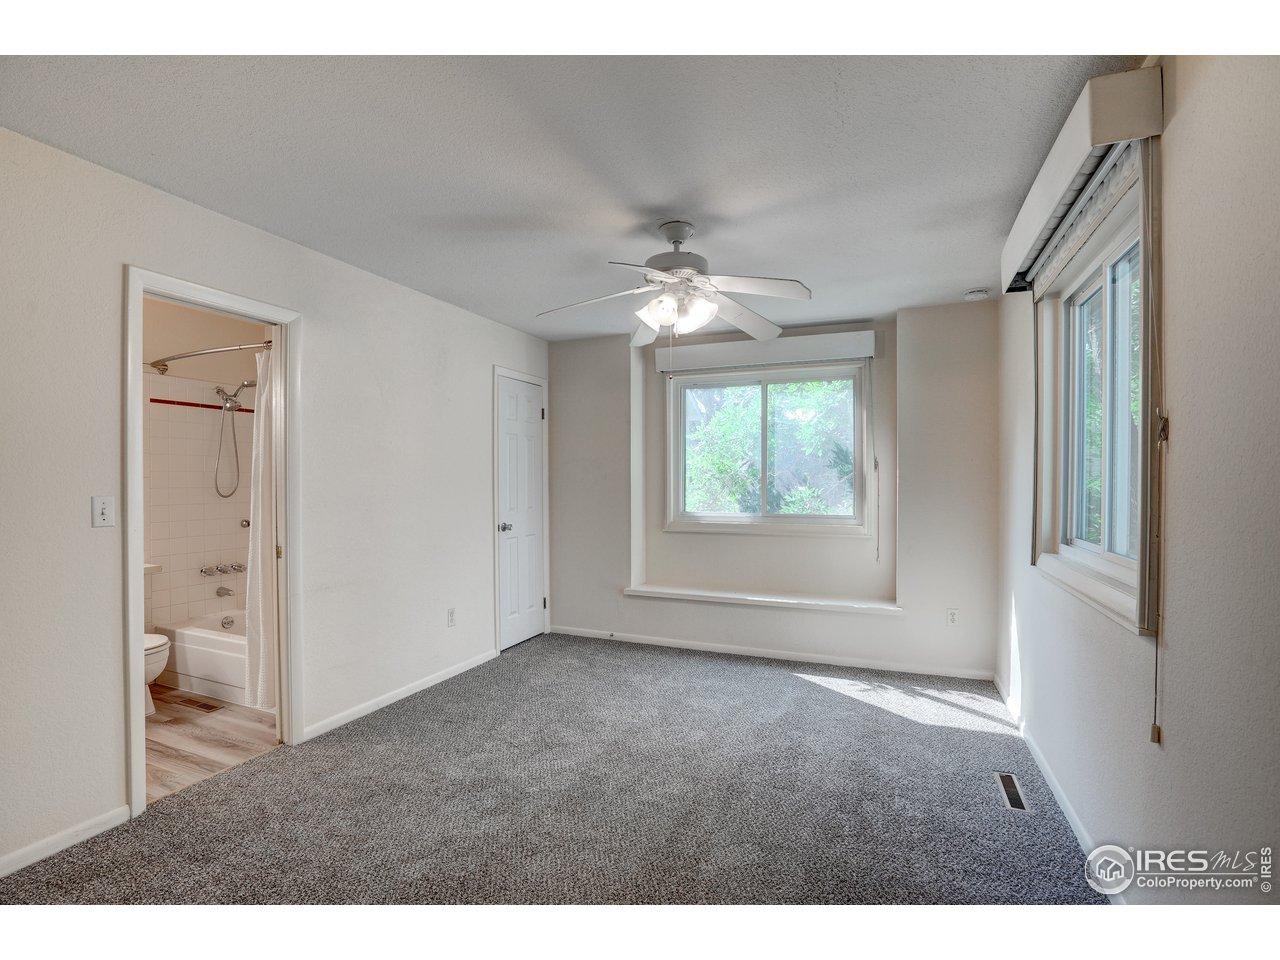 2nd floor bedroom with ceiling fan